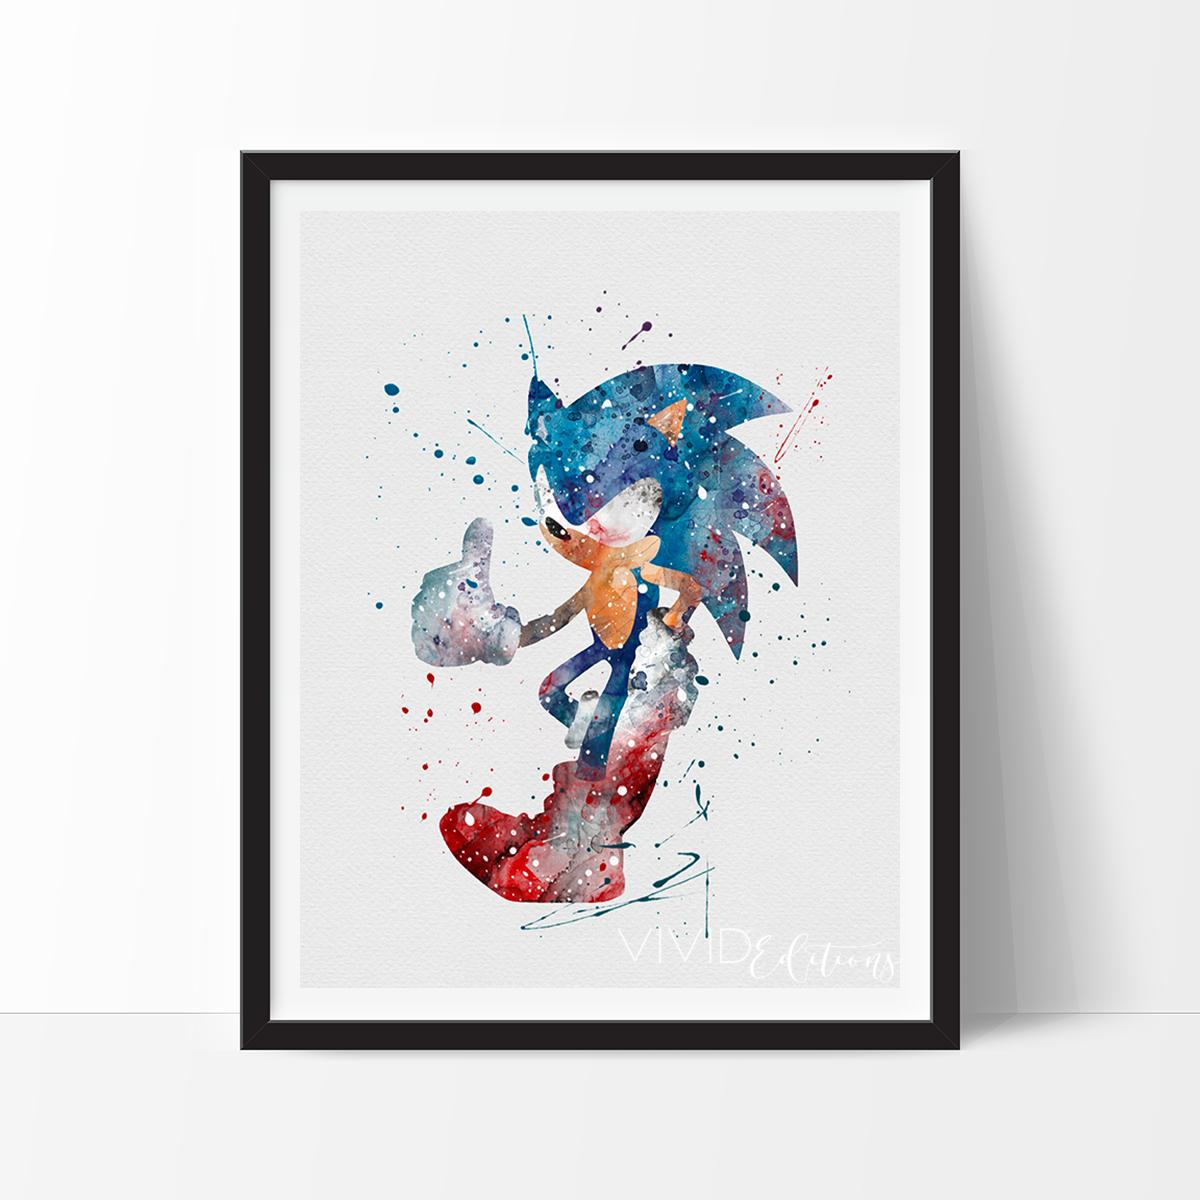 Sonic The Hedgehog Watercolor Art Print Dibujos Pinturas Acuarela